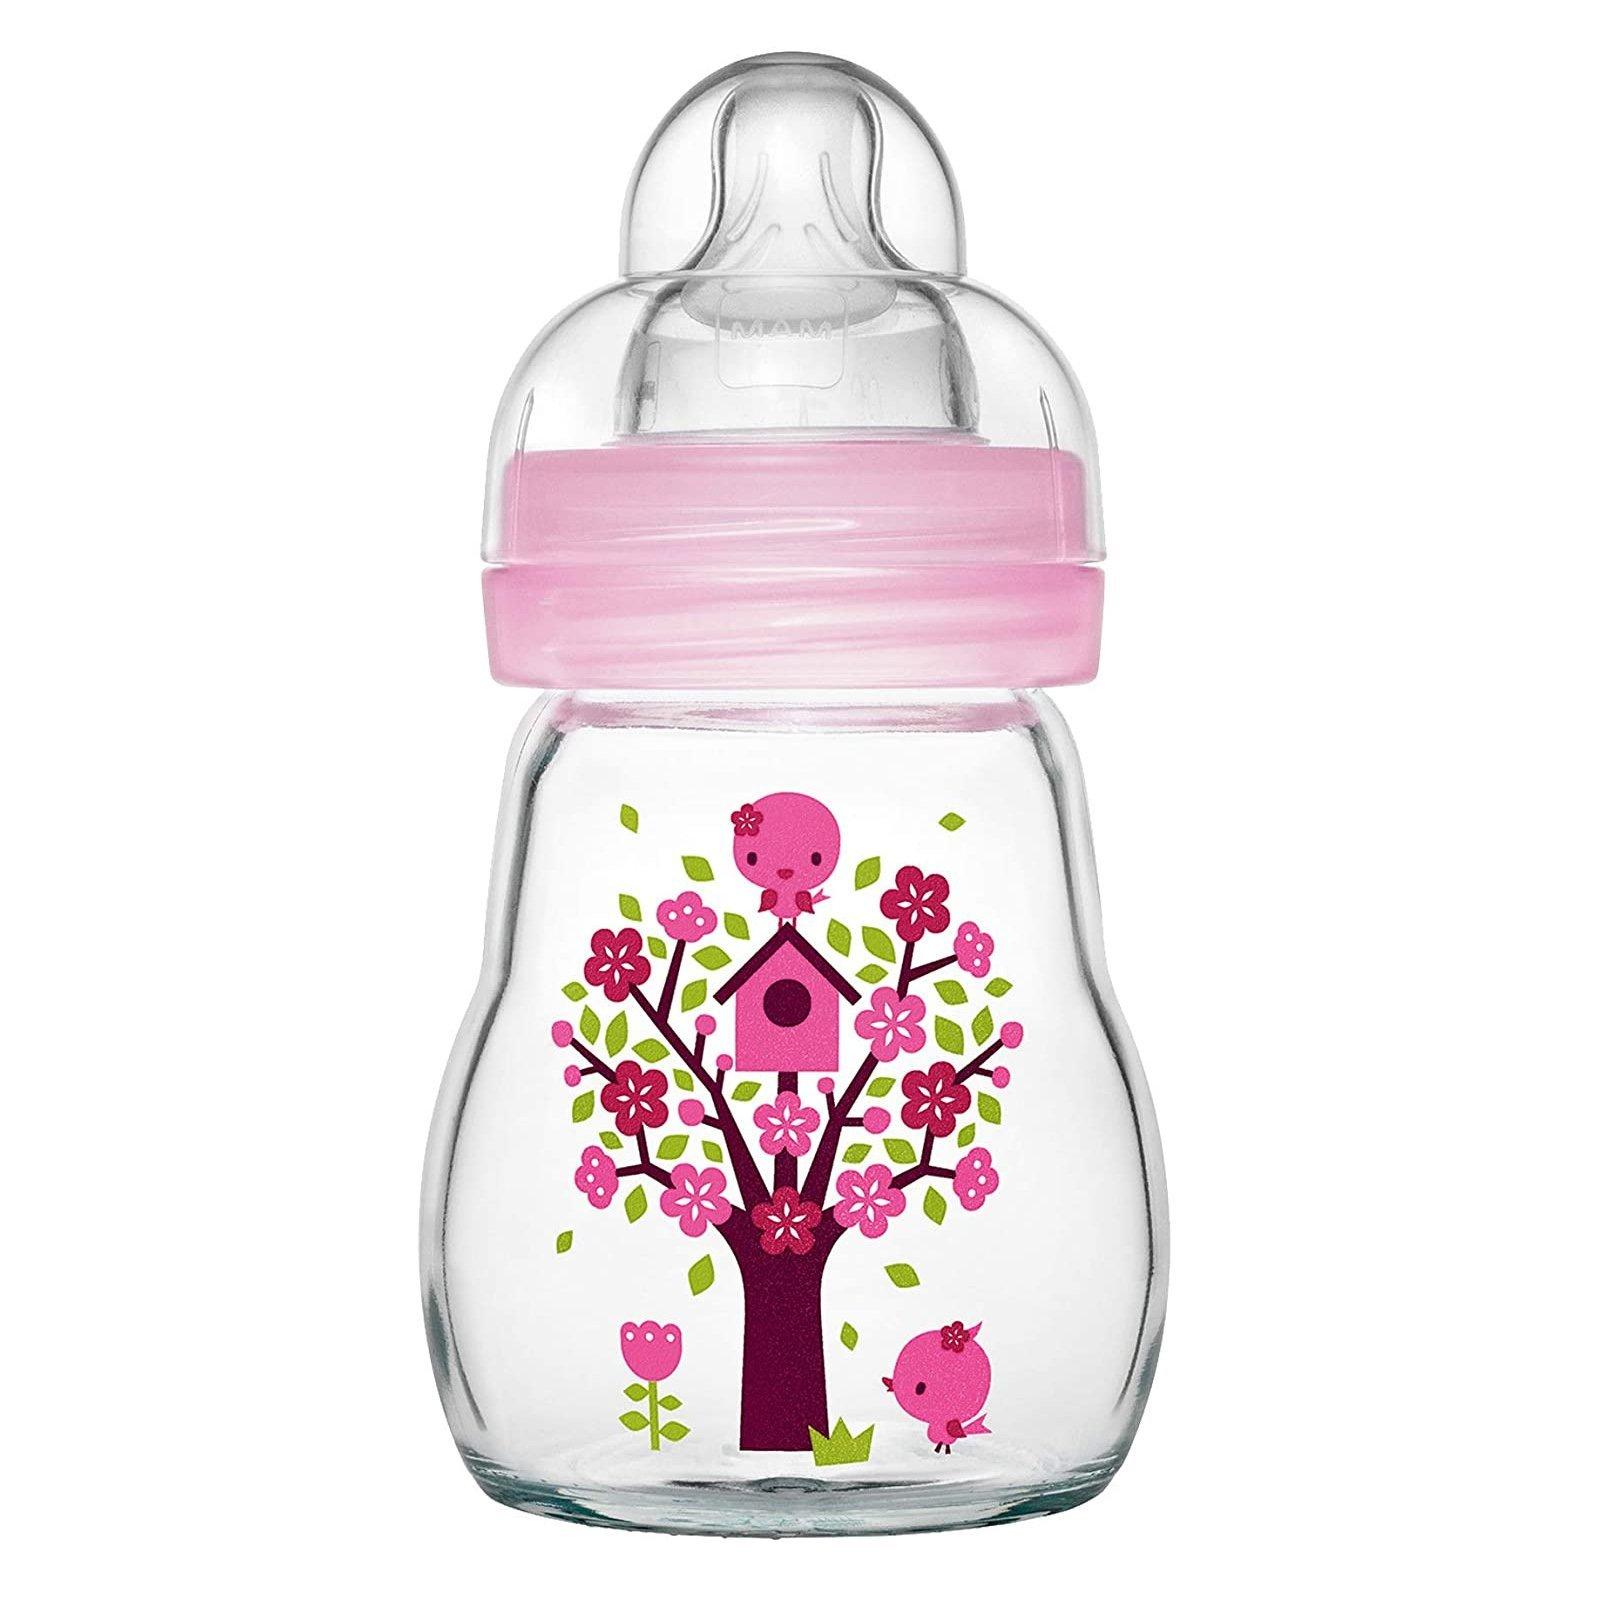 Mam Feel Good Κωδ 370S1 Γυάλινο Μπιμπερό με Θηλή Σιλικόνης από 0+ Μηνών 170ml – ροζ